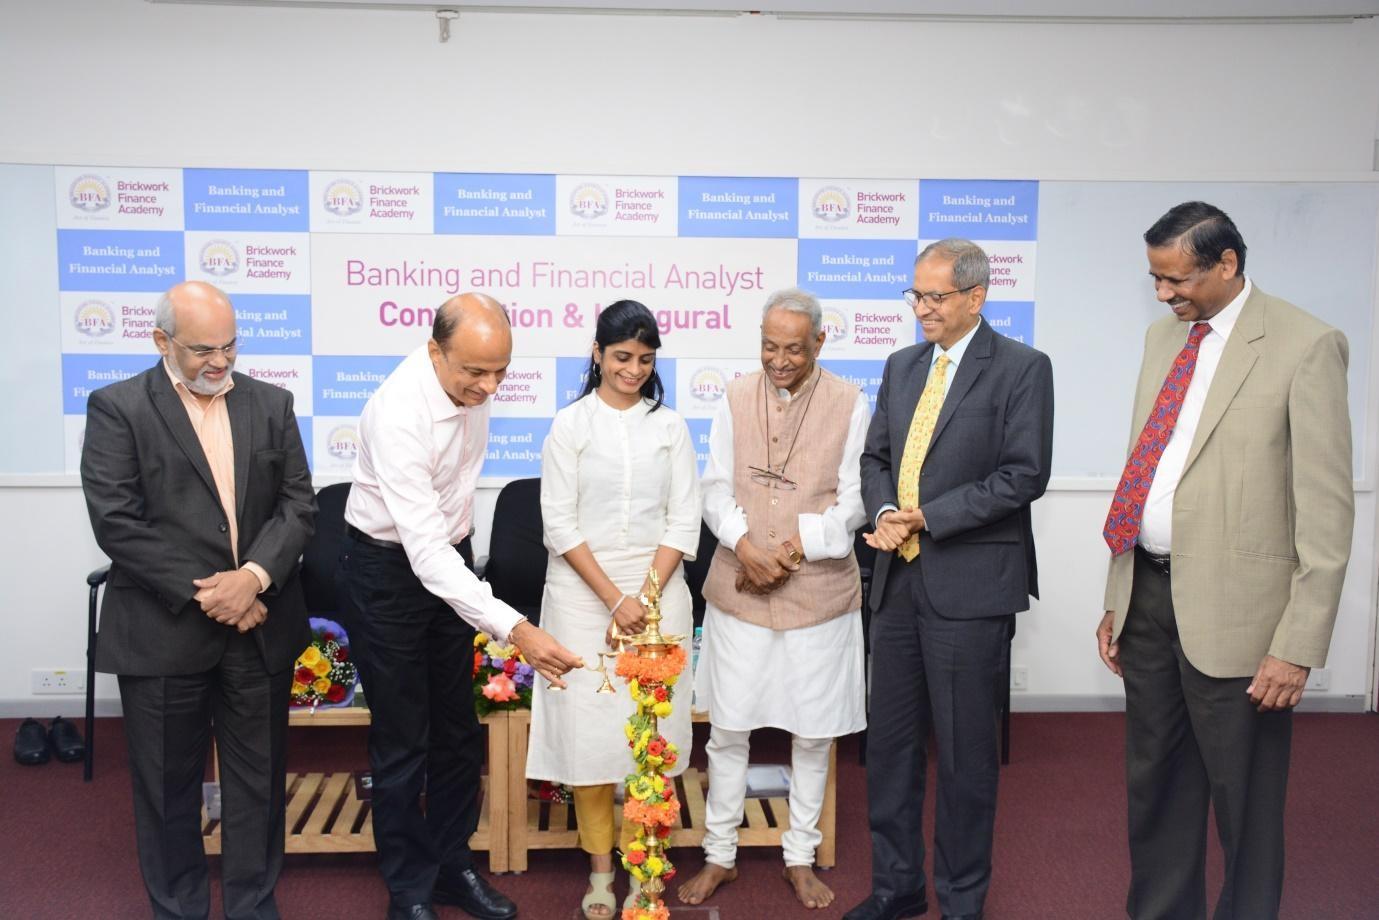 (L-R) Shri Santosh Kamath is seen lighting the lamp along with Shri D Ravishankar, Ms. Hema Sethia (topper of the Class of 2018), Prof. KRS Murthy, Shri Vivek Kulkarni and Shri MSR Manjunatha, Head Ratings Administration, Brickwork Ratings